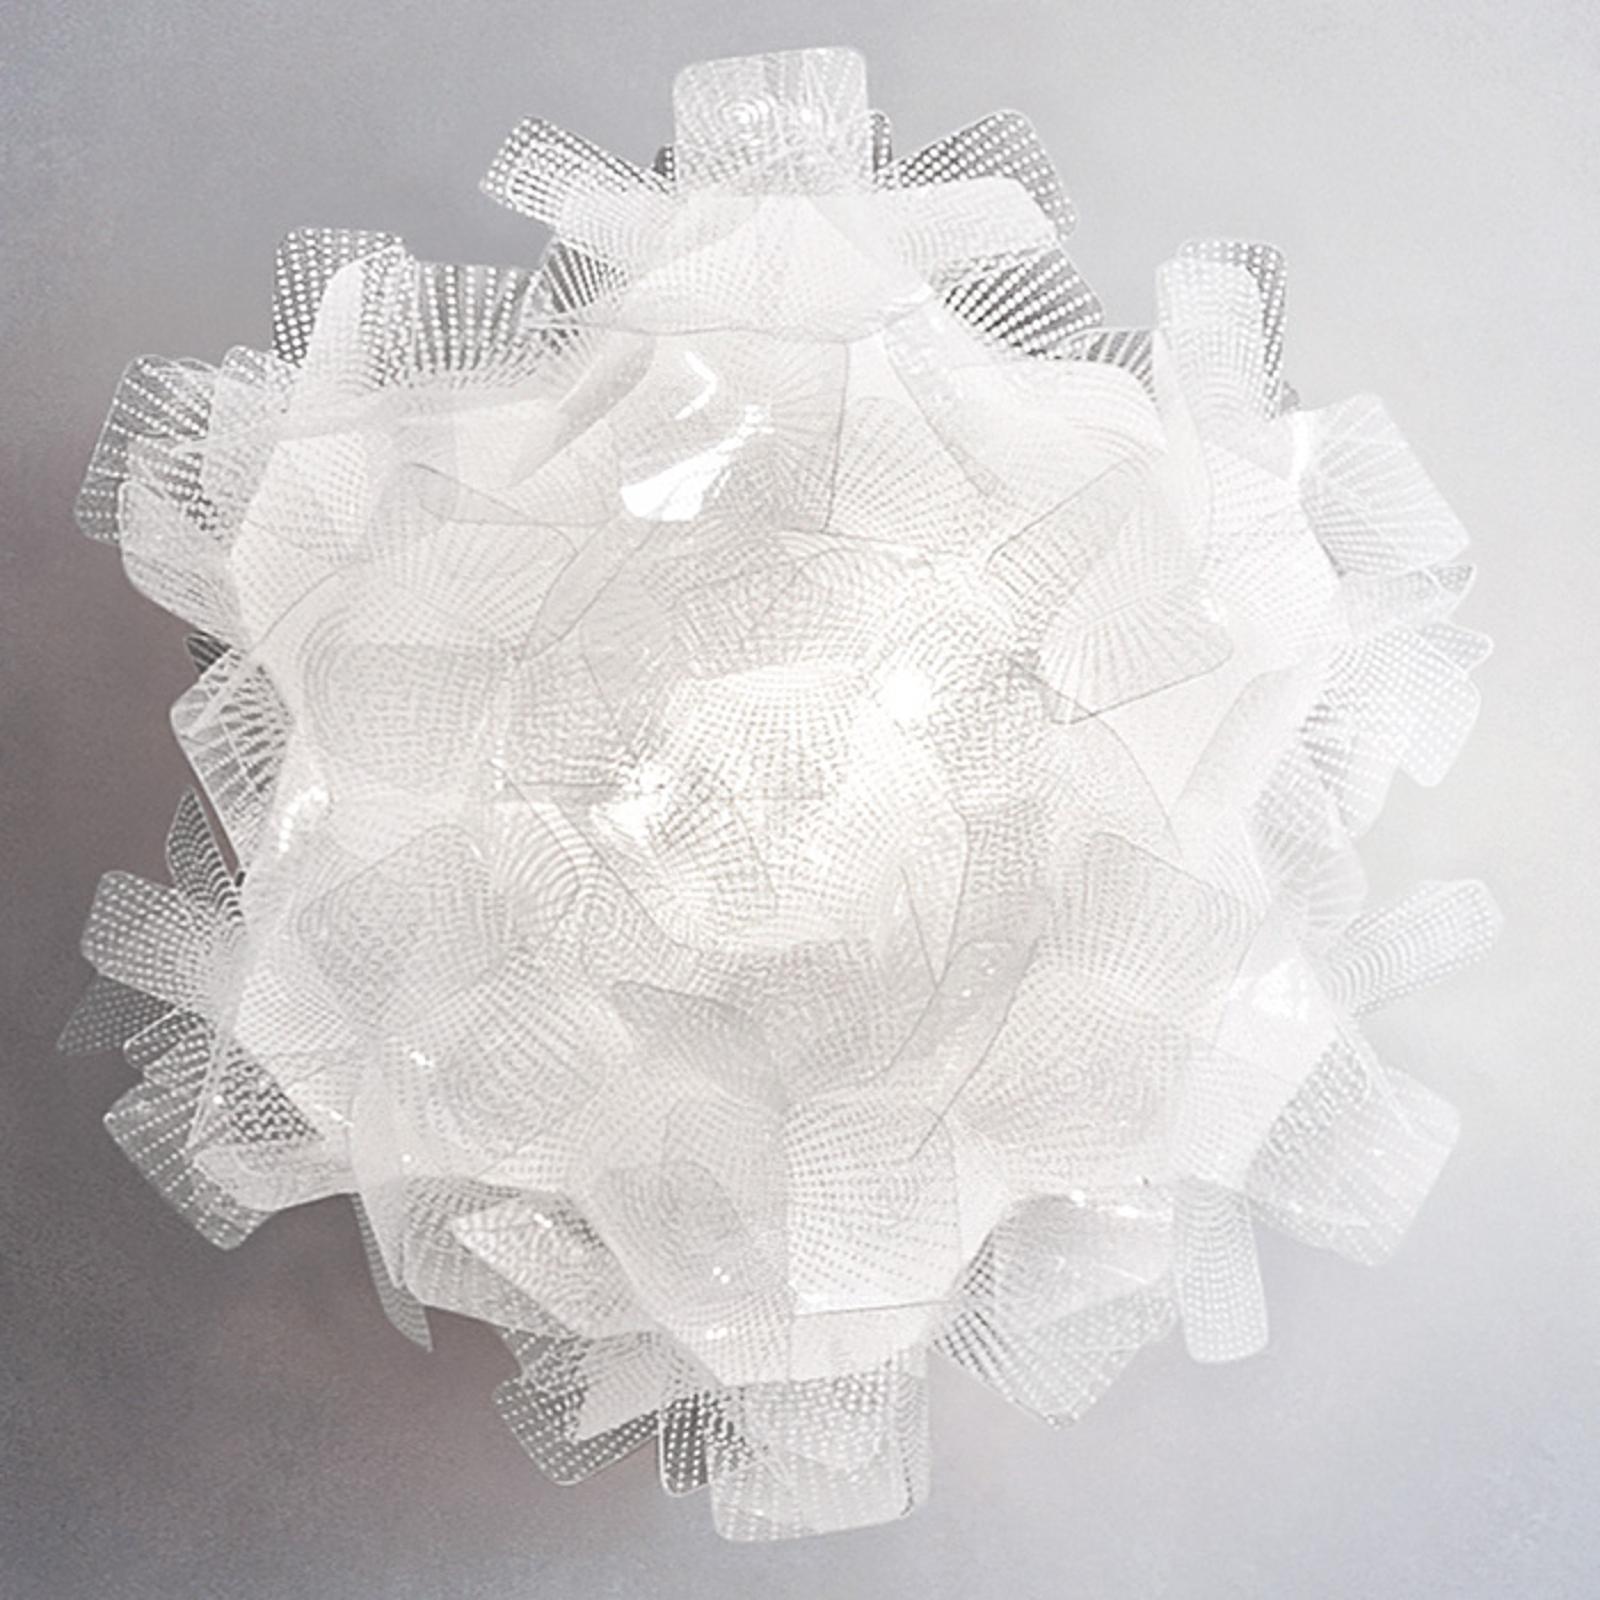 Slamp Clizia Pixel -seinävalaisin Ø 53 cm